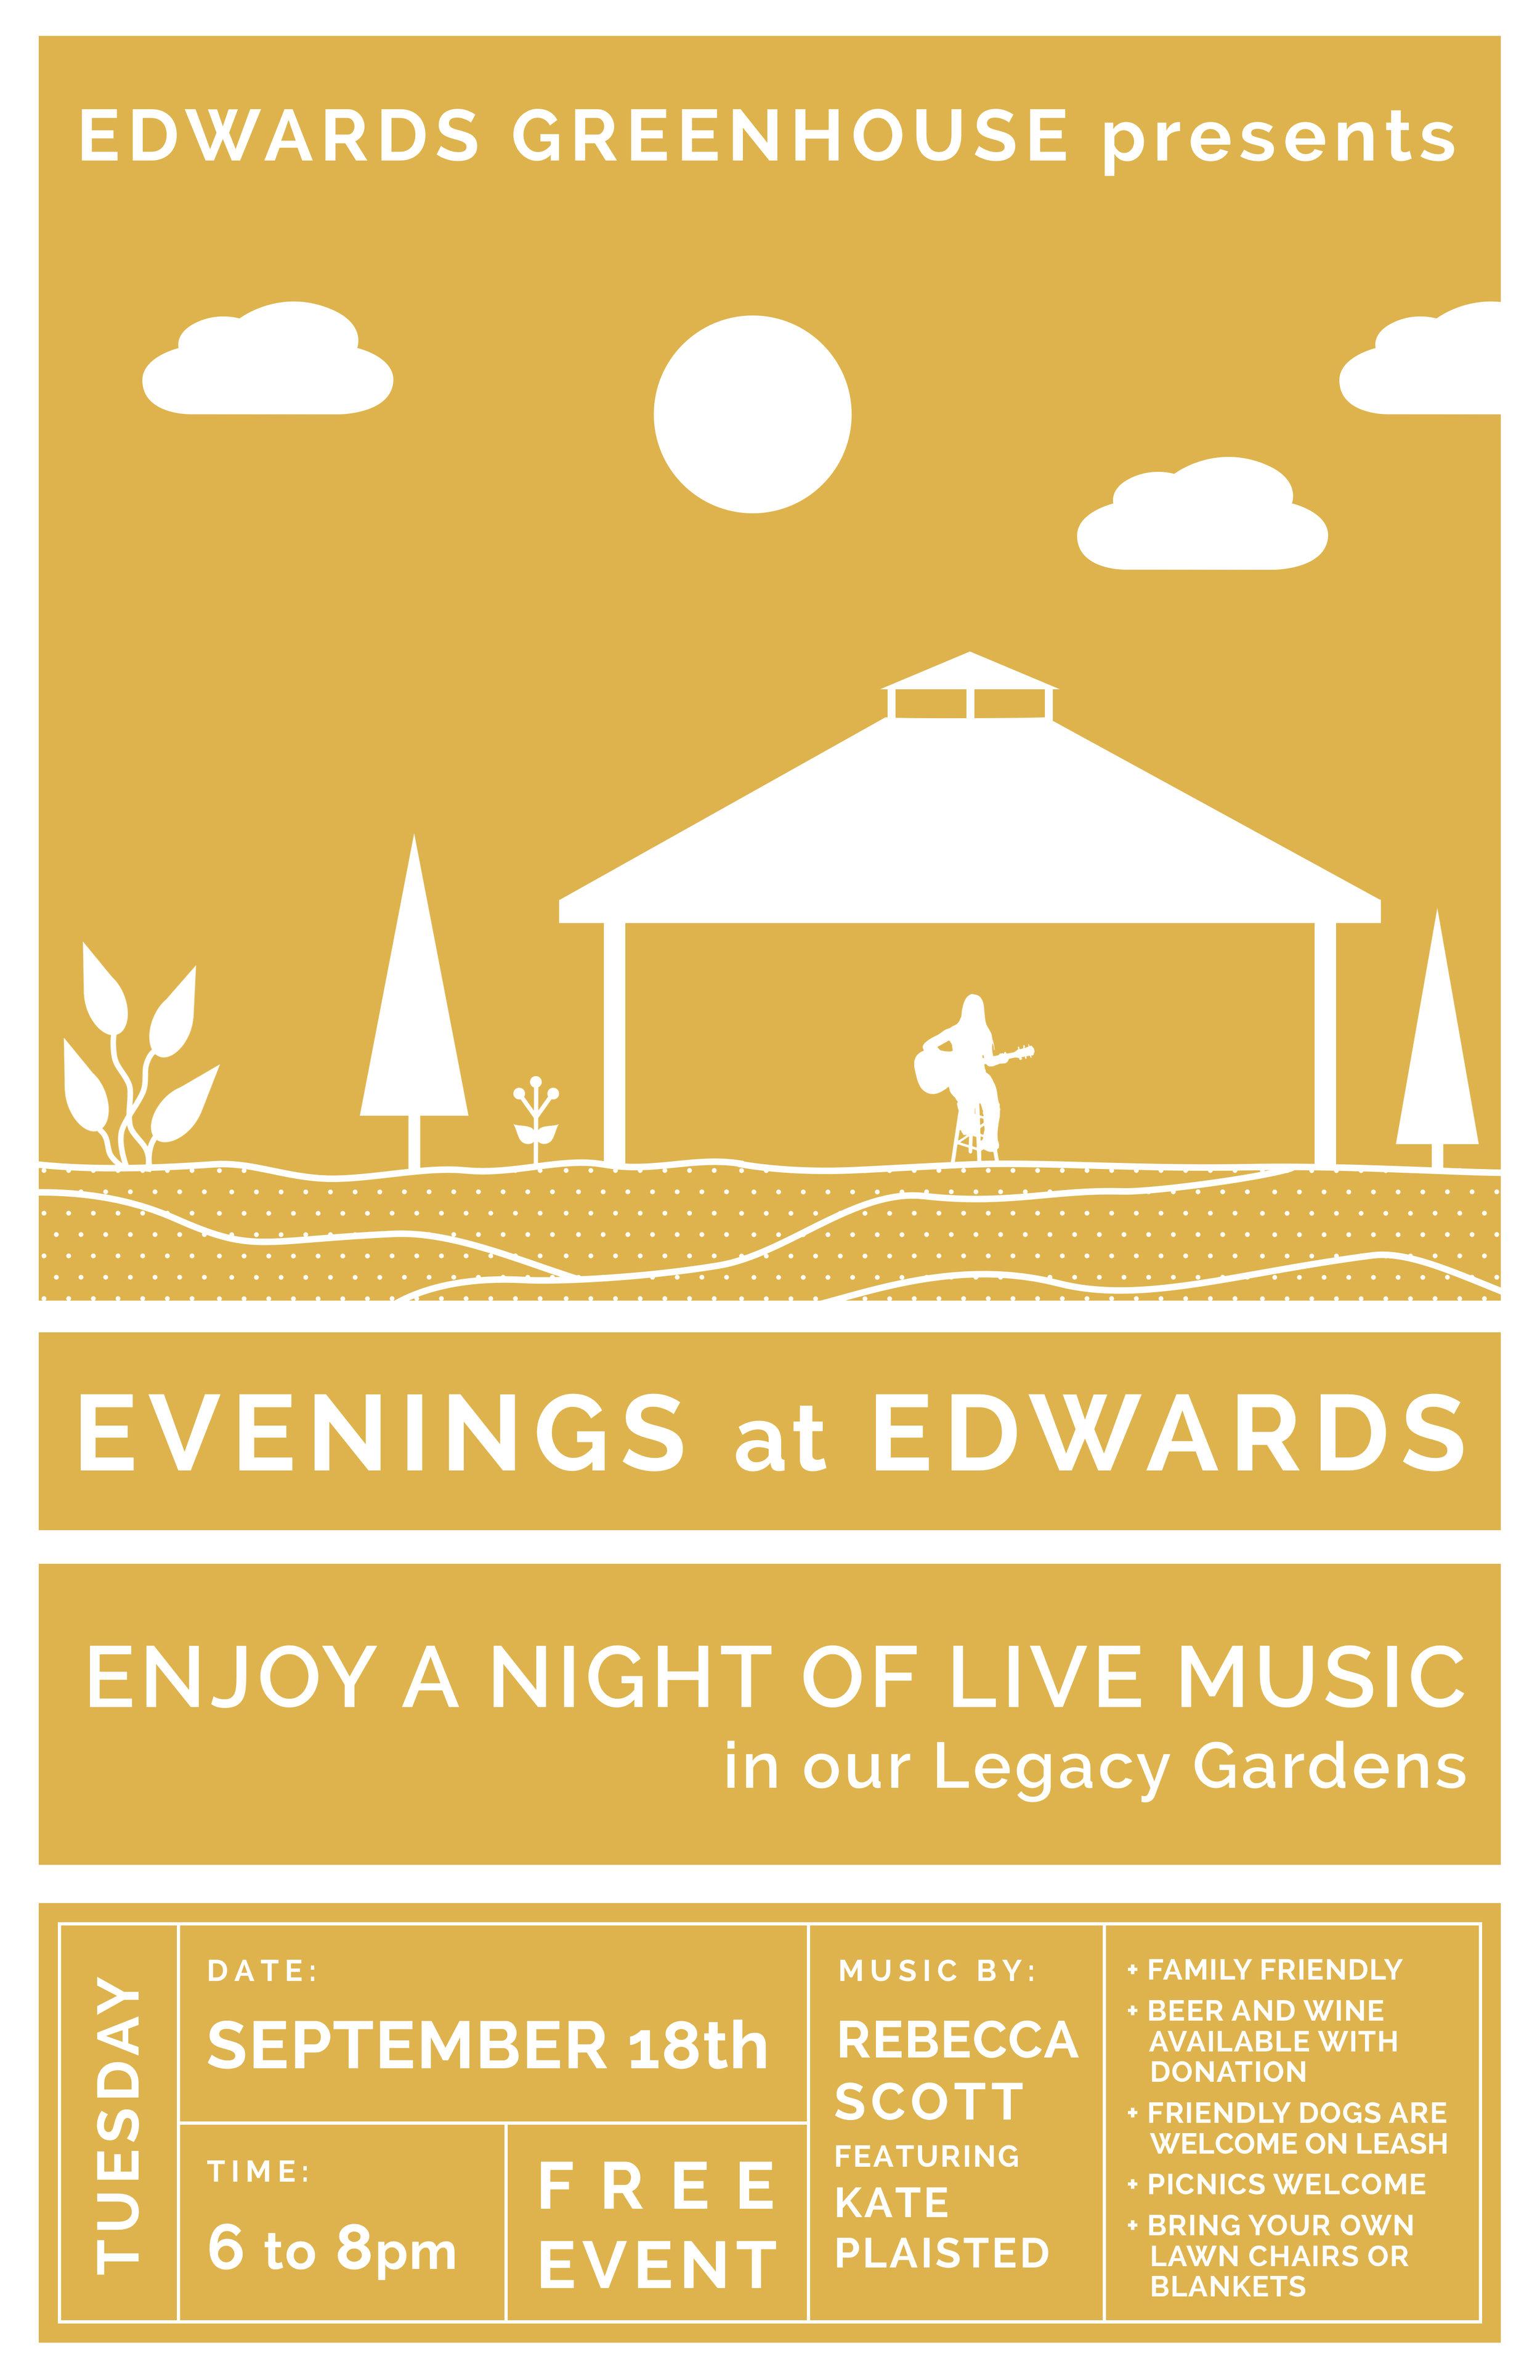 evening at edwards 2018 sept 18th.jpg